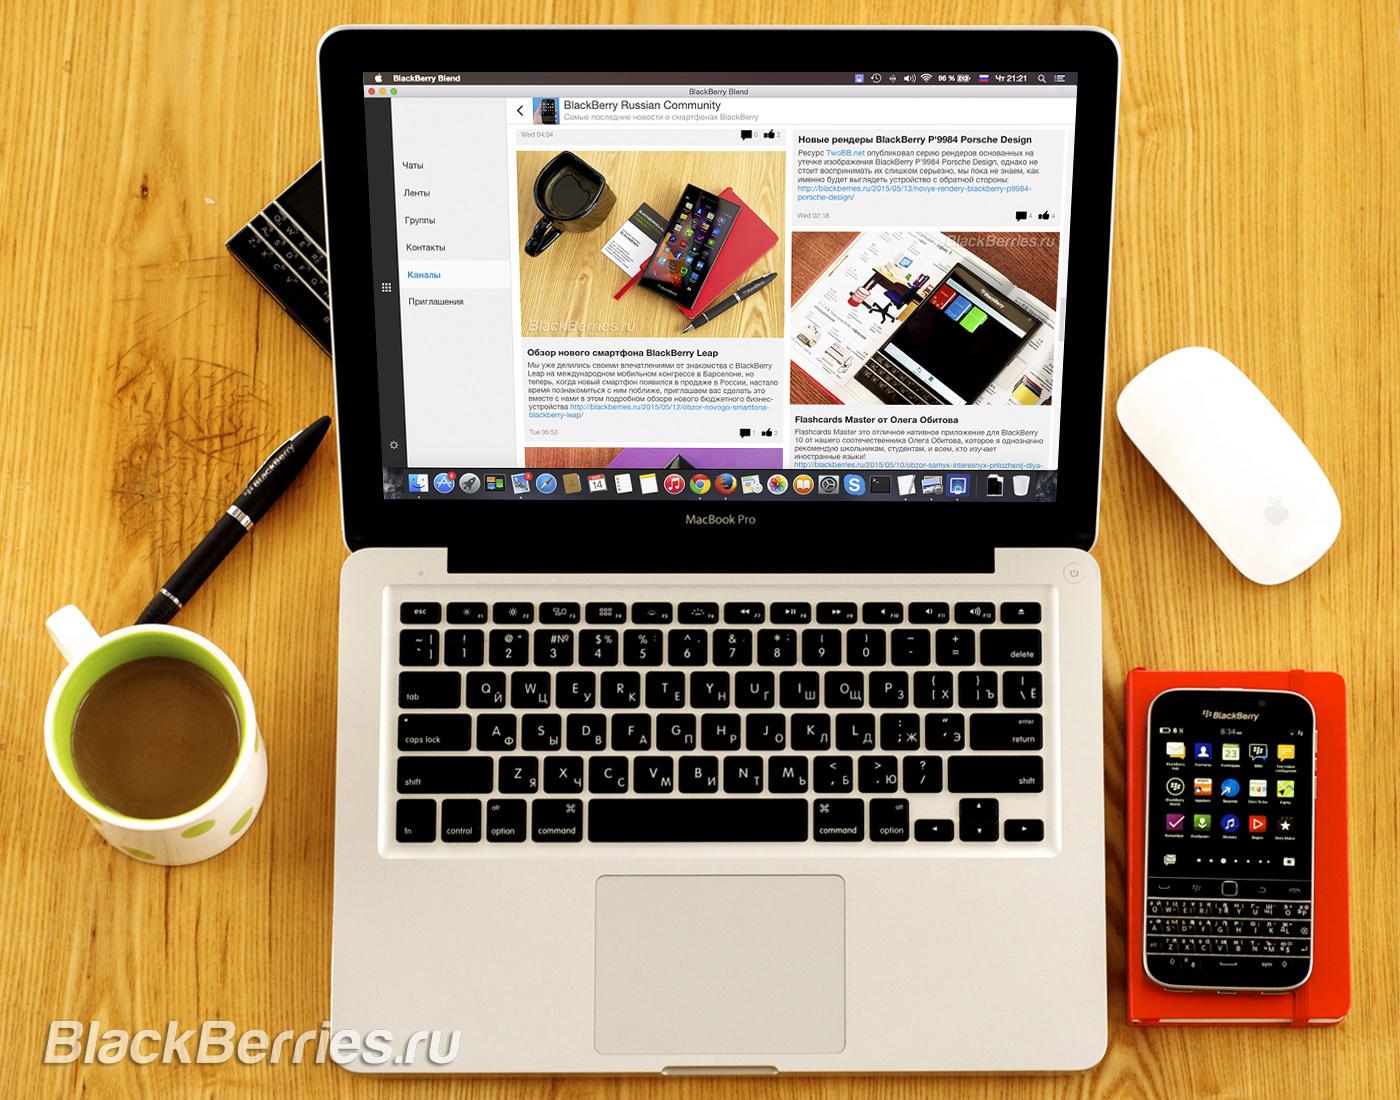 BlackBerry-Blend-3 copy